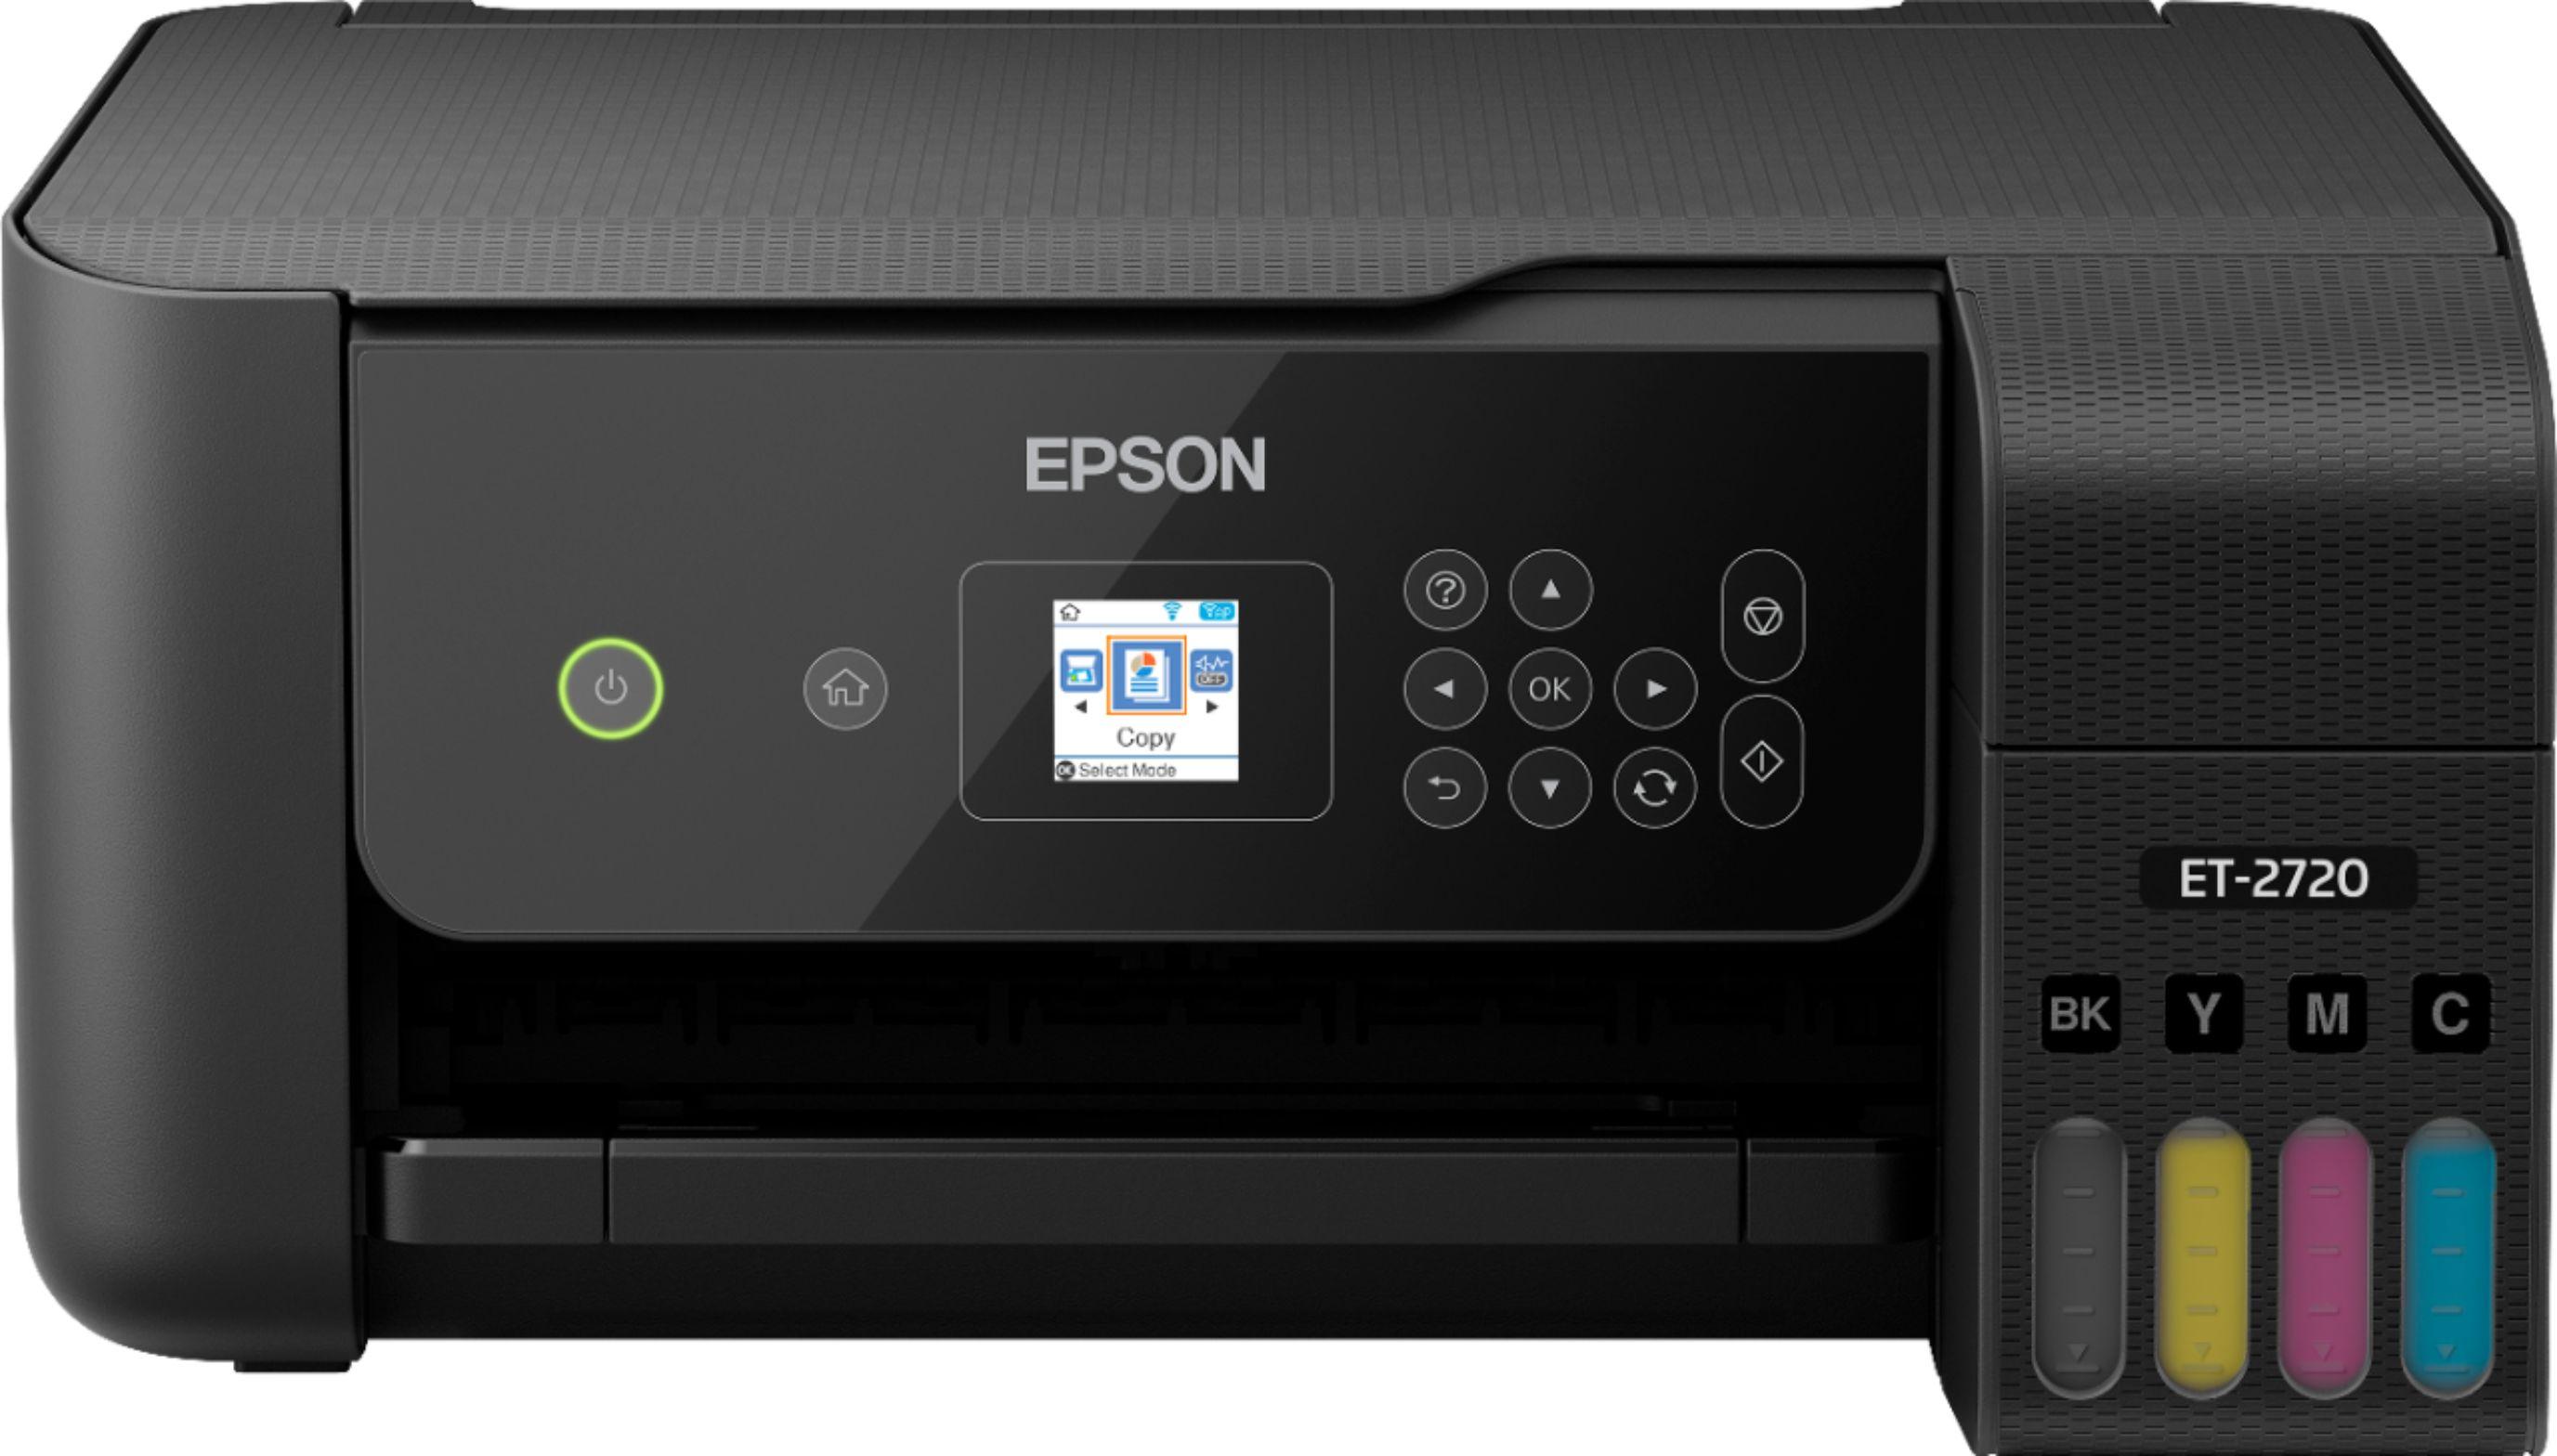 Epson ECOTANK ET-2720  C11CH42201 alternateViewsImage